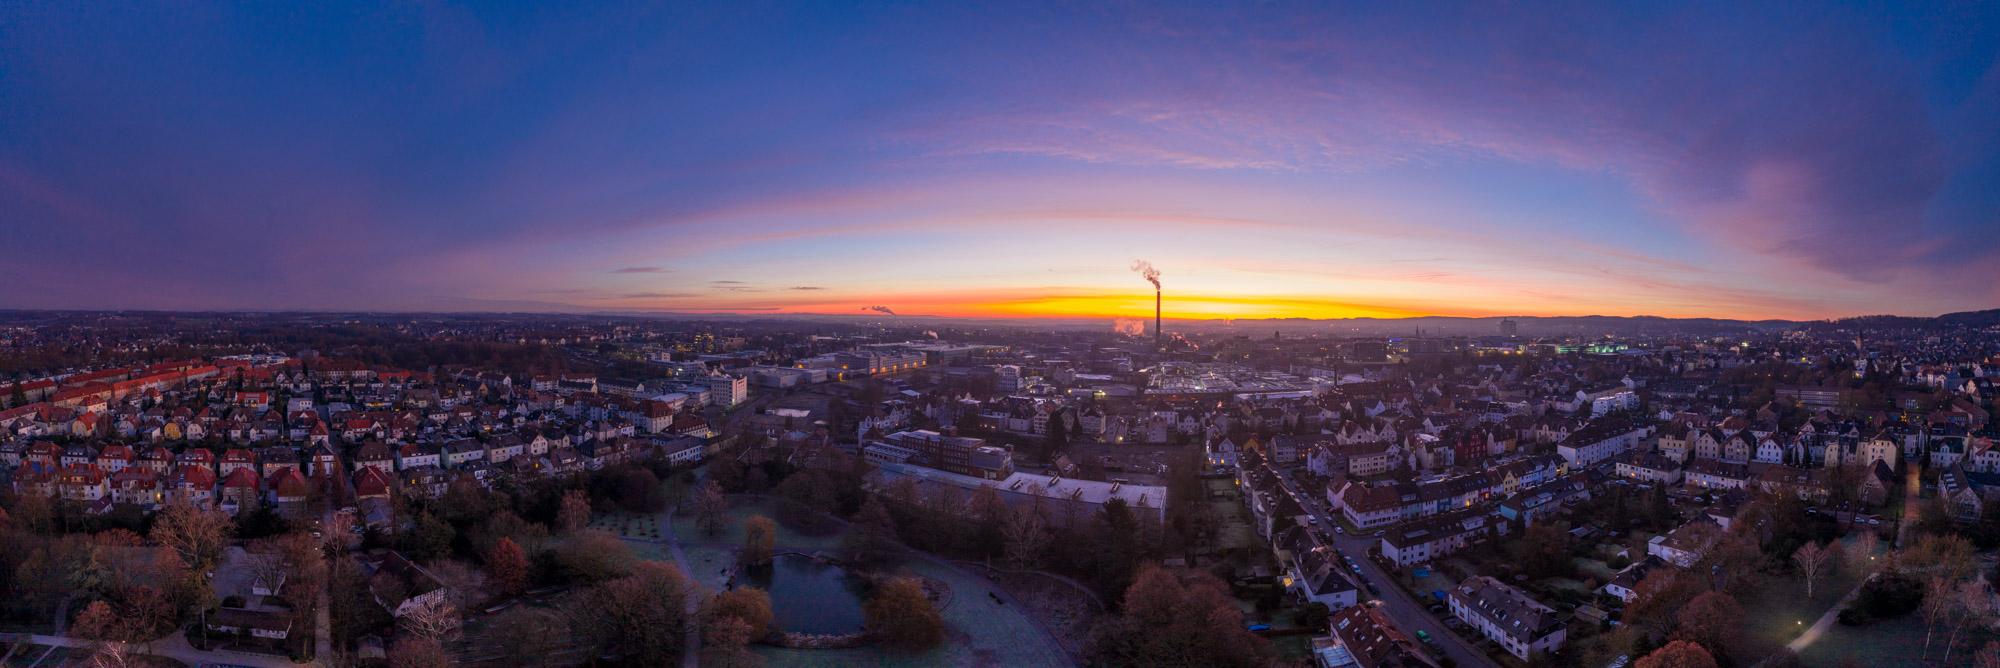 Winter Bielefeld